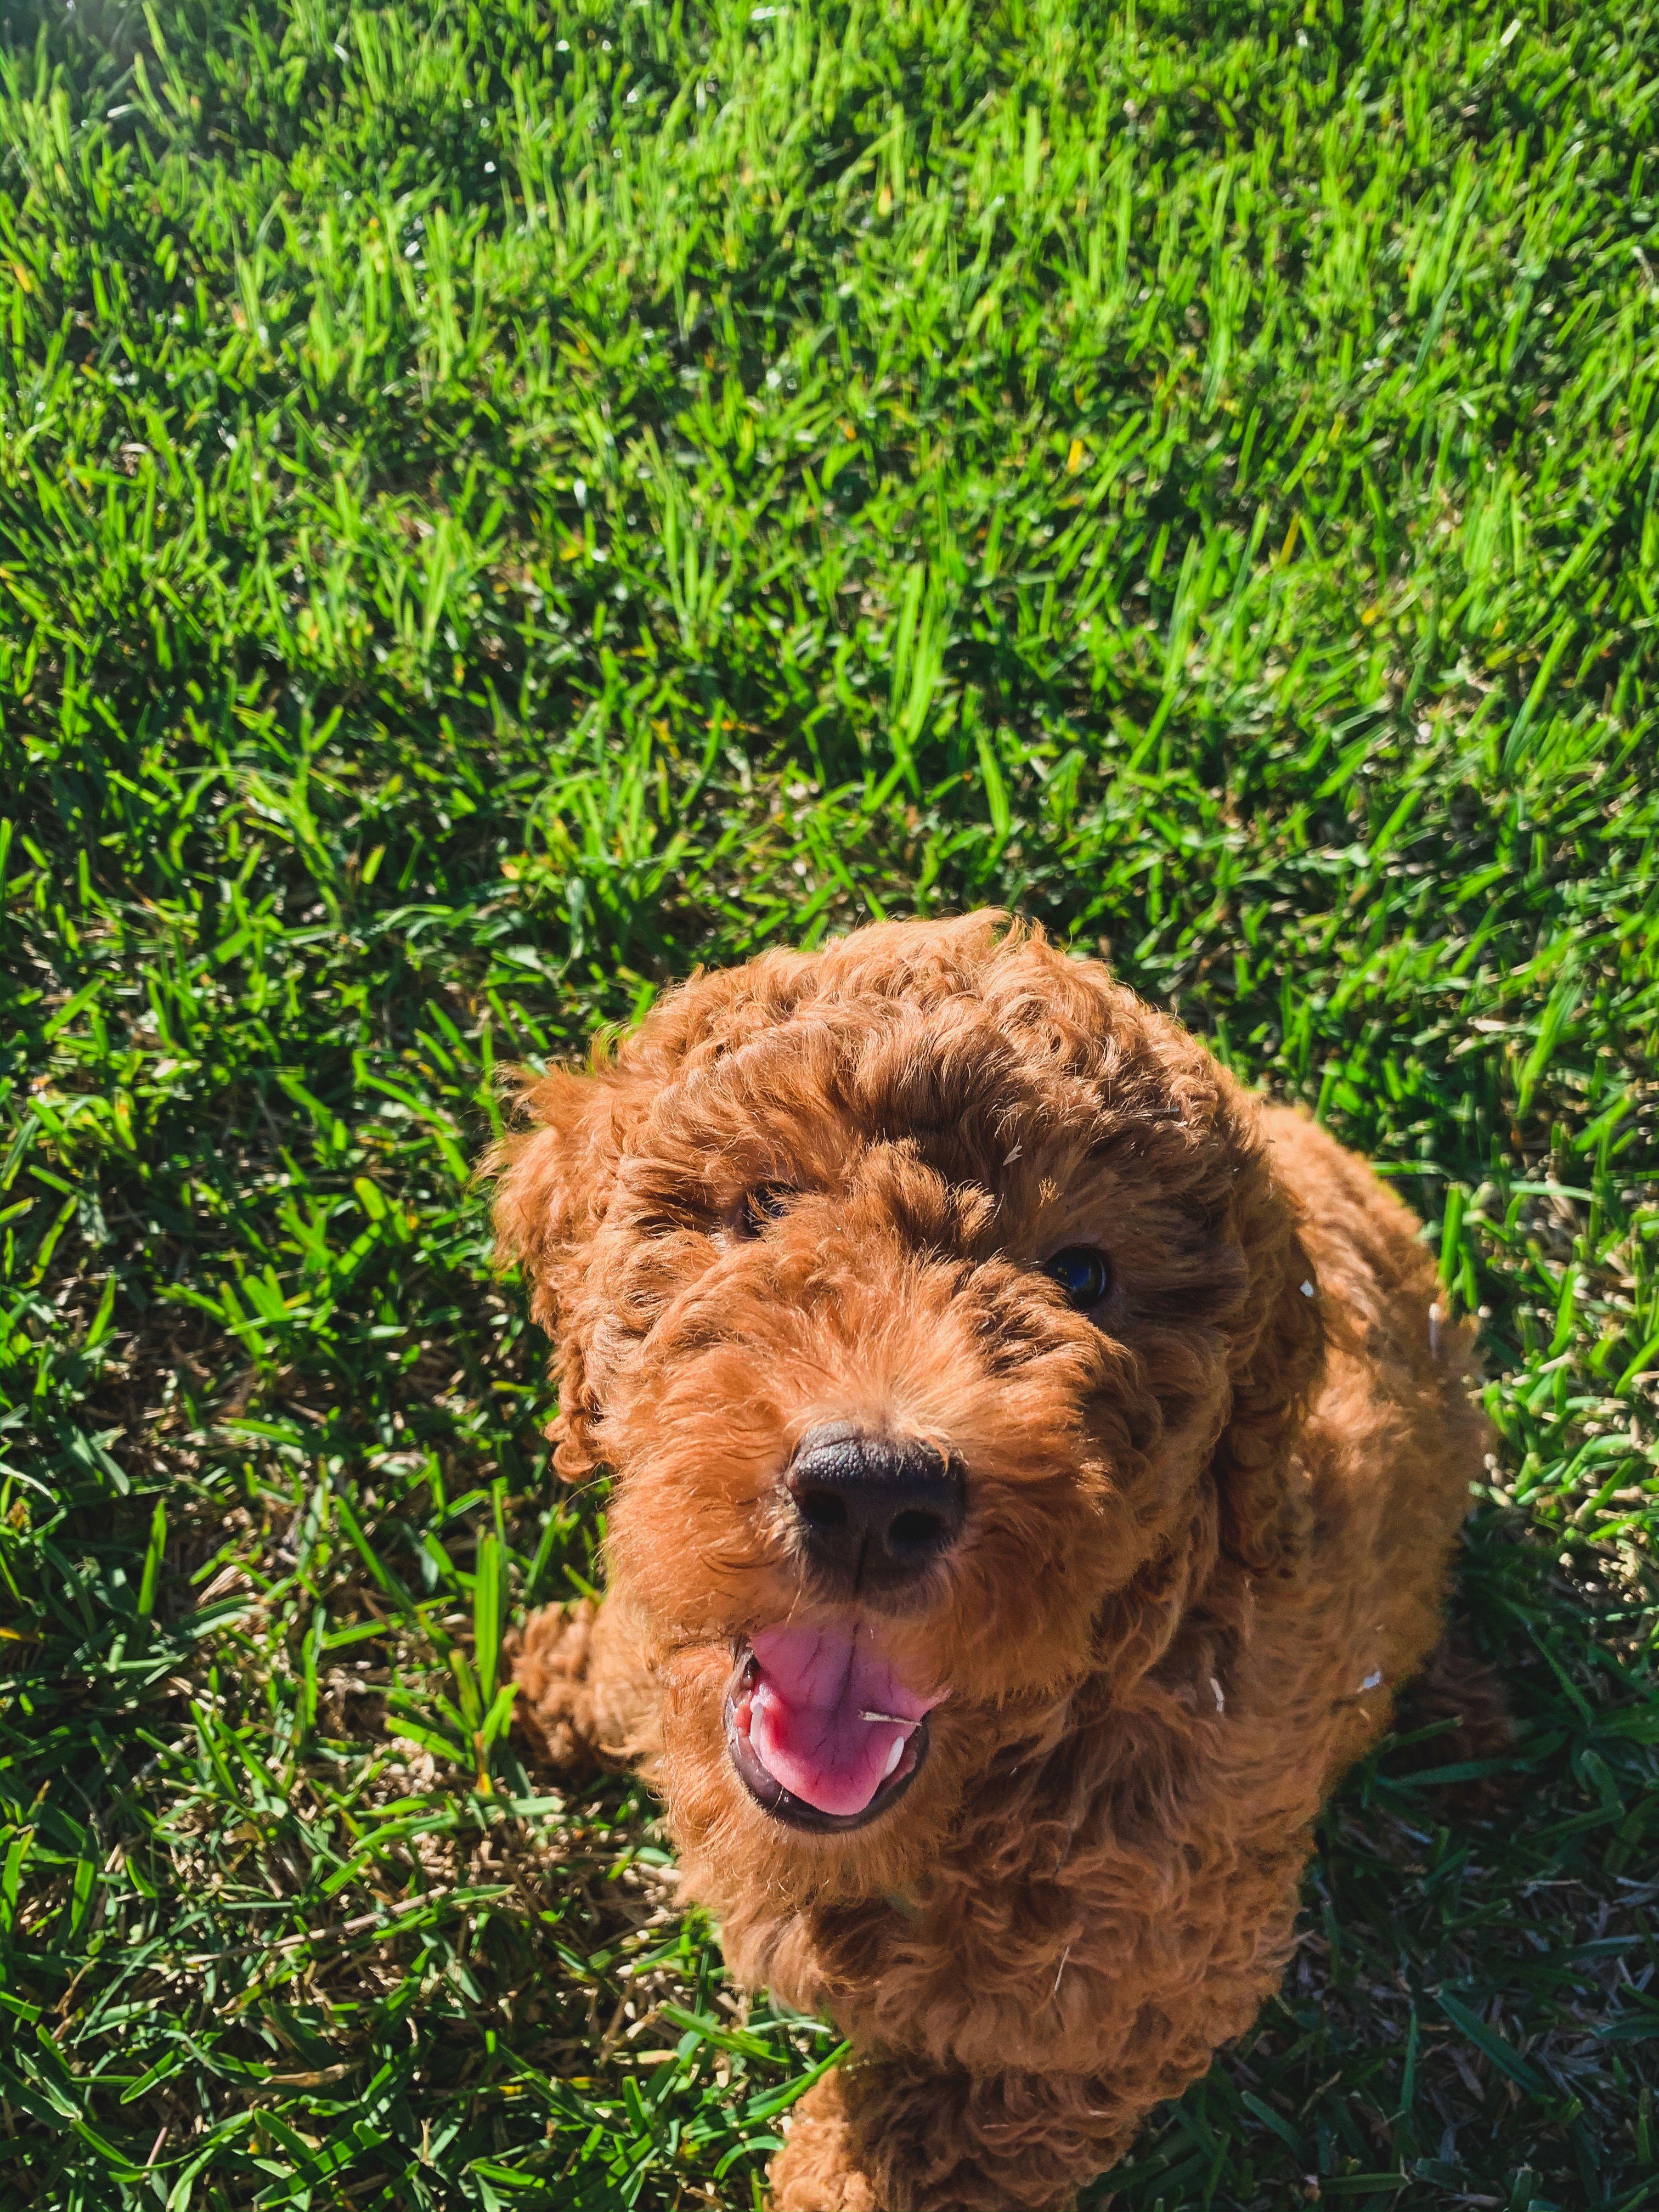 Oregon live puppies goldendoodle